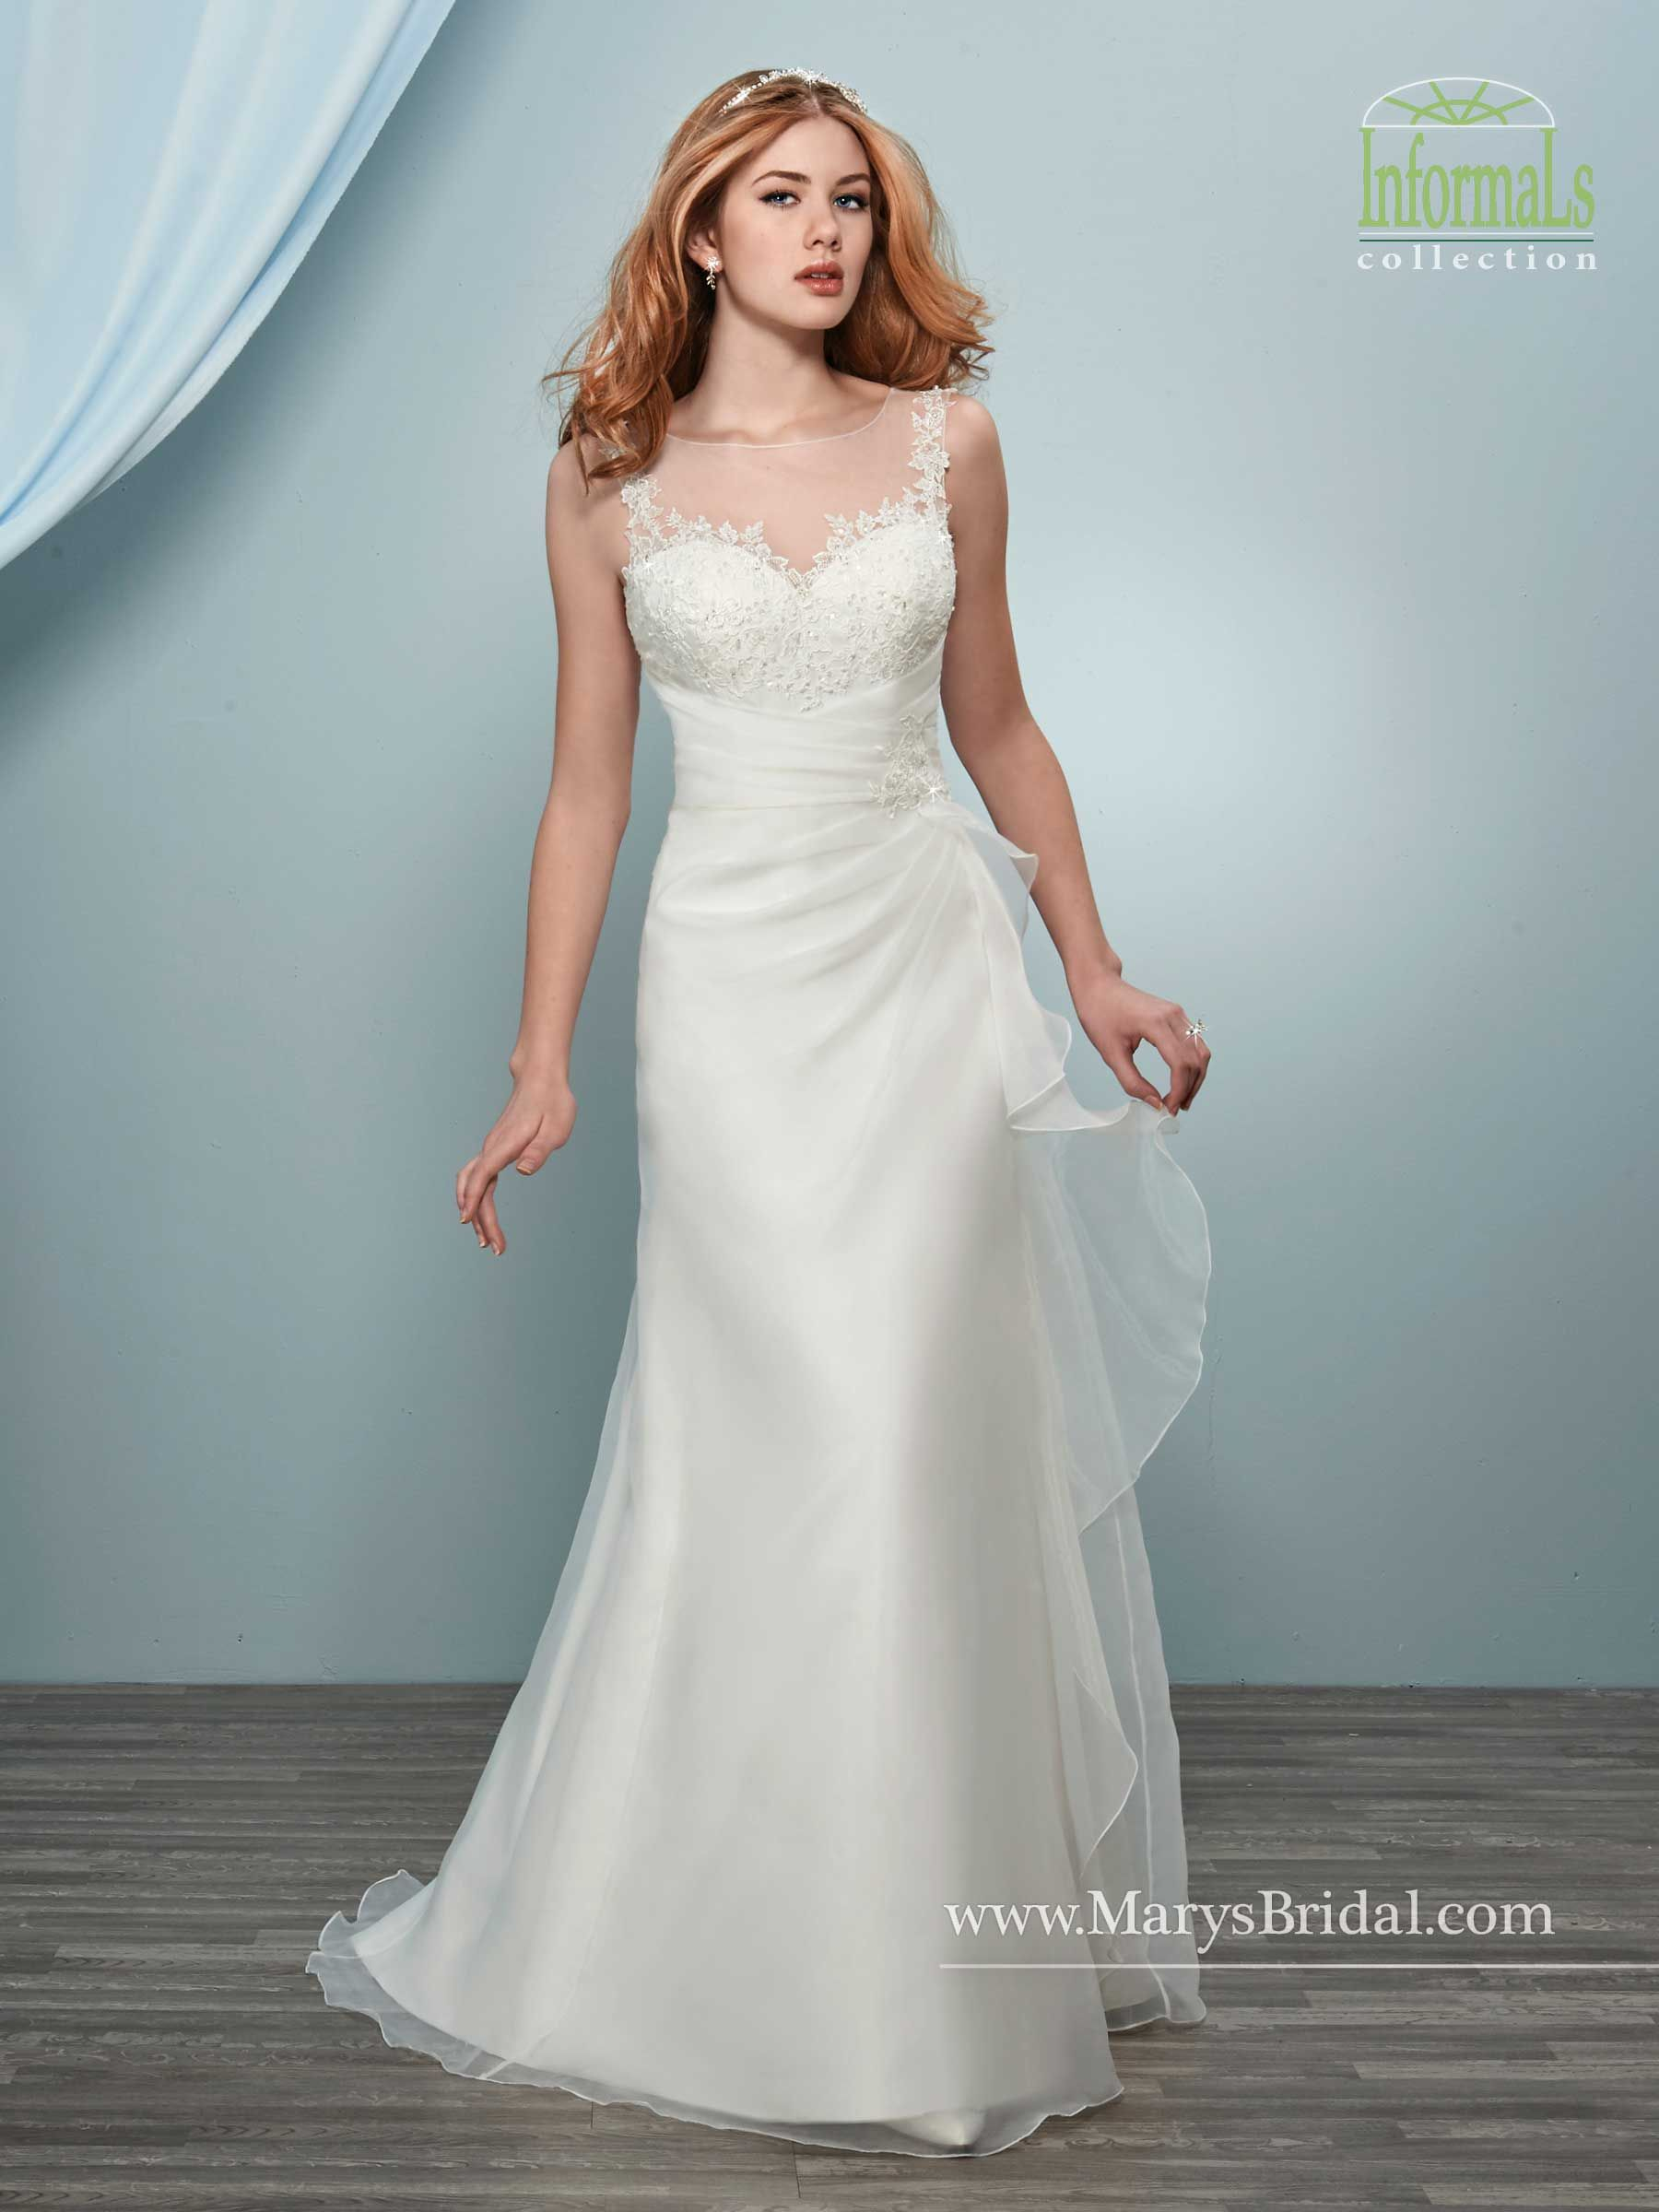 Cool Wedding Dress Greenville Sc Contemporary Wedding Ideas